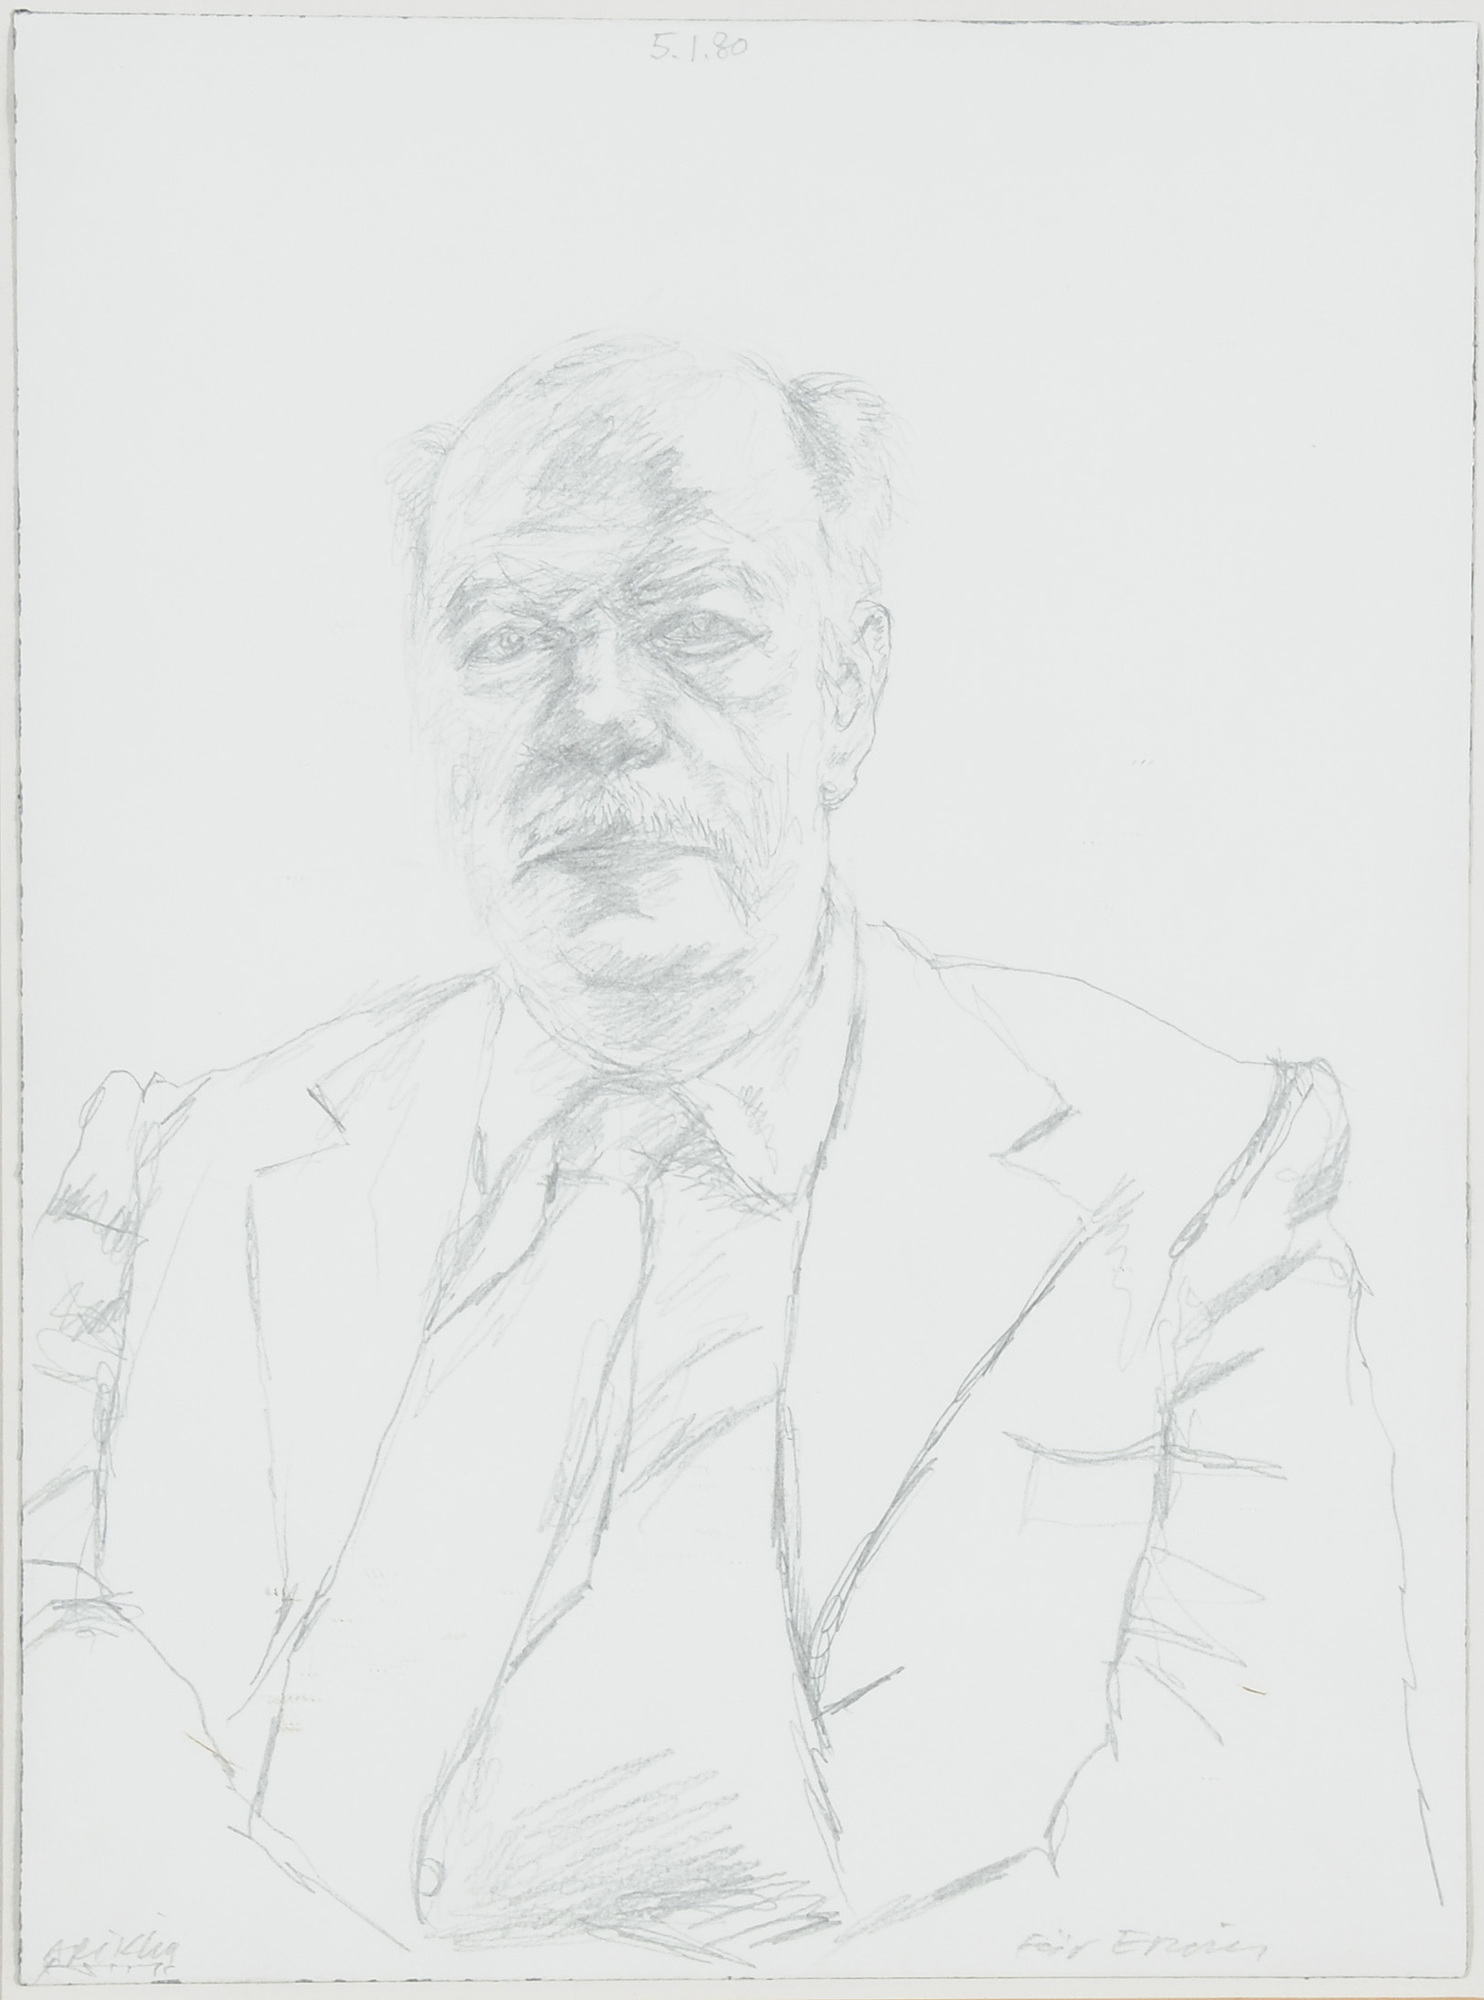 Arikha Avigdor, Bildnis Erwin Leiser (Portrait Erwin Leiser)